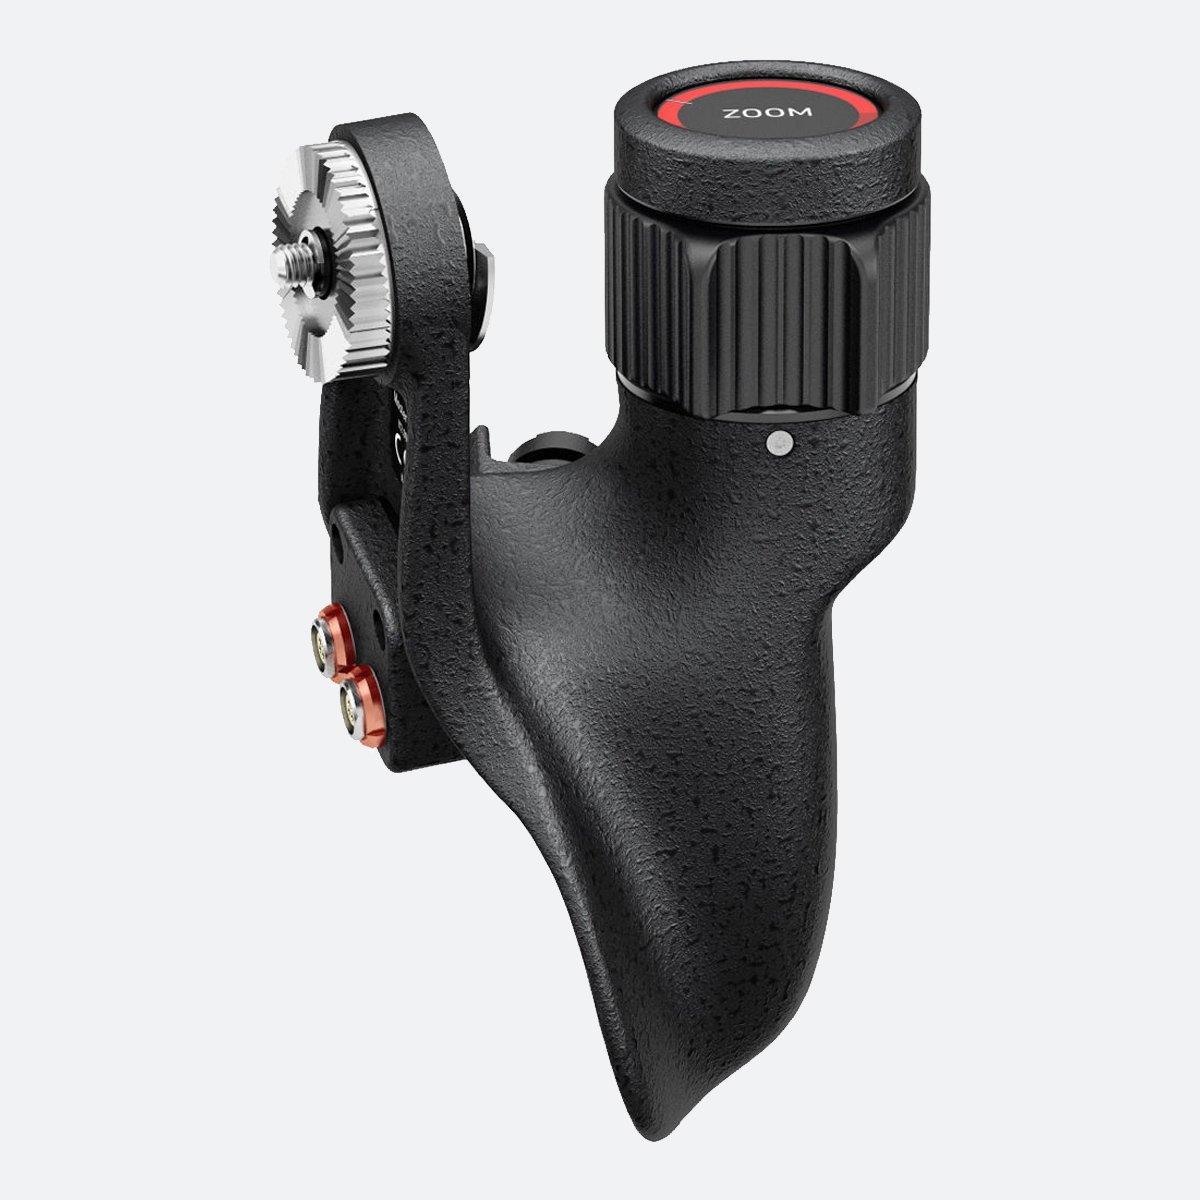 ARRI Master Grip Right Rocker MRR-1 Ultimate control